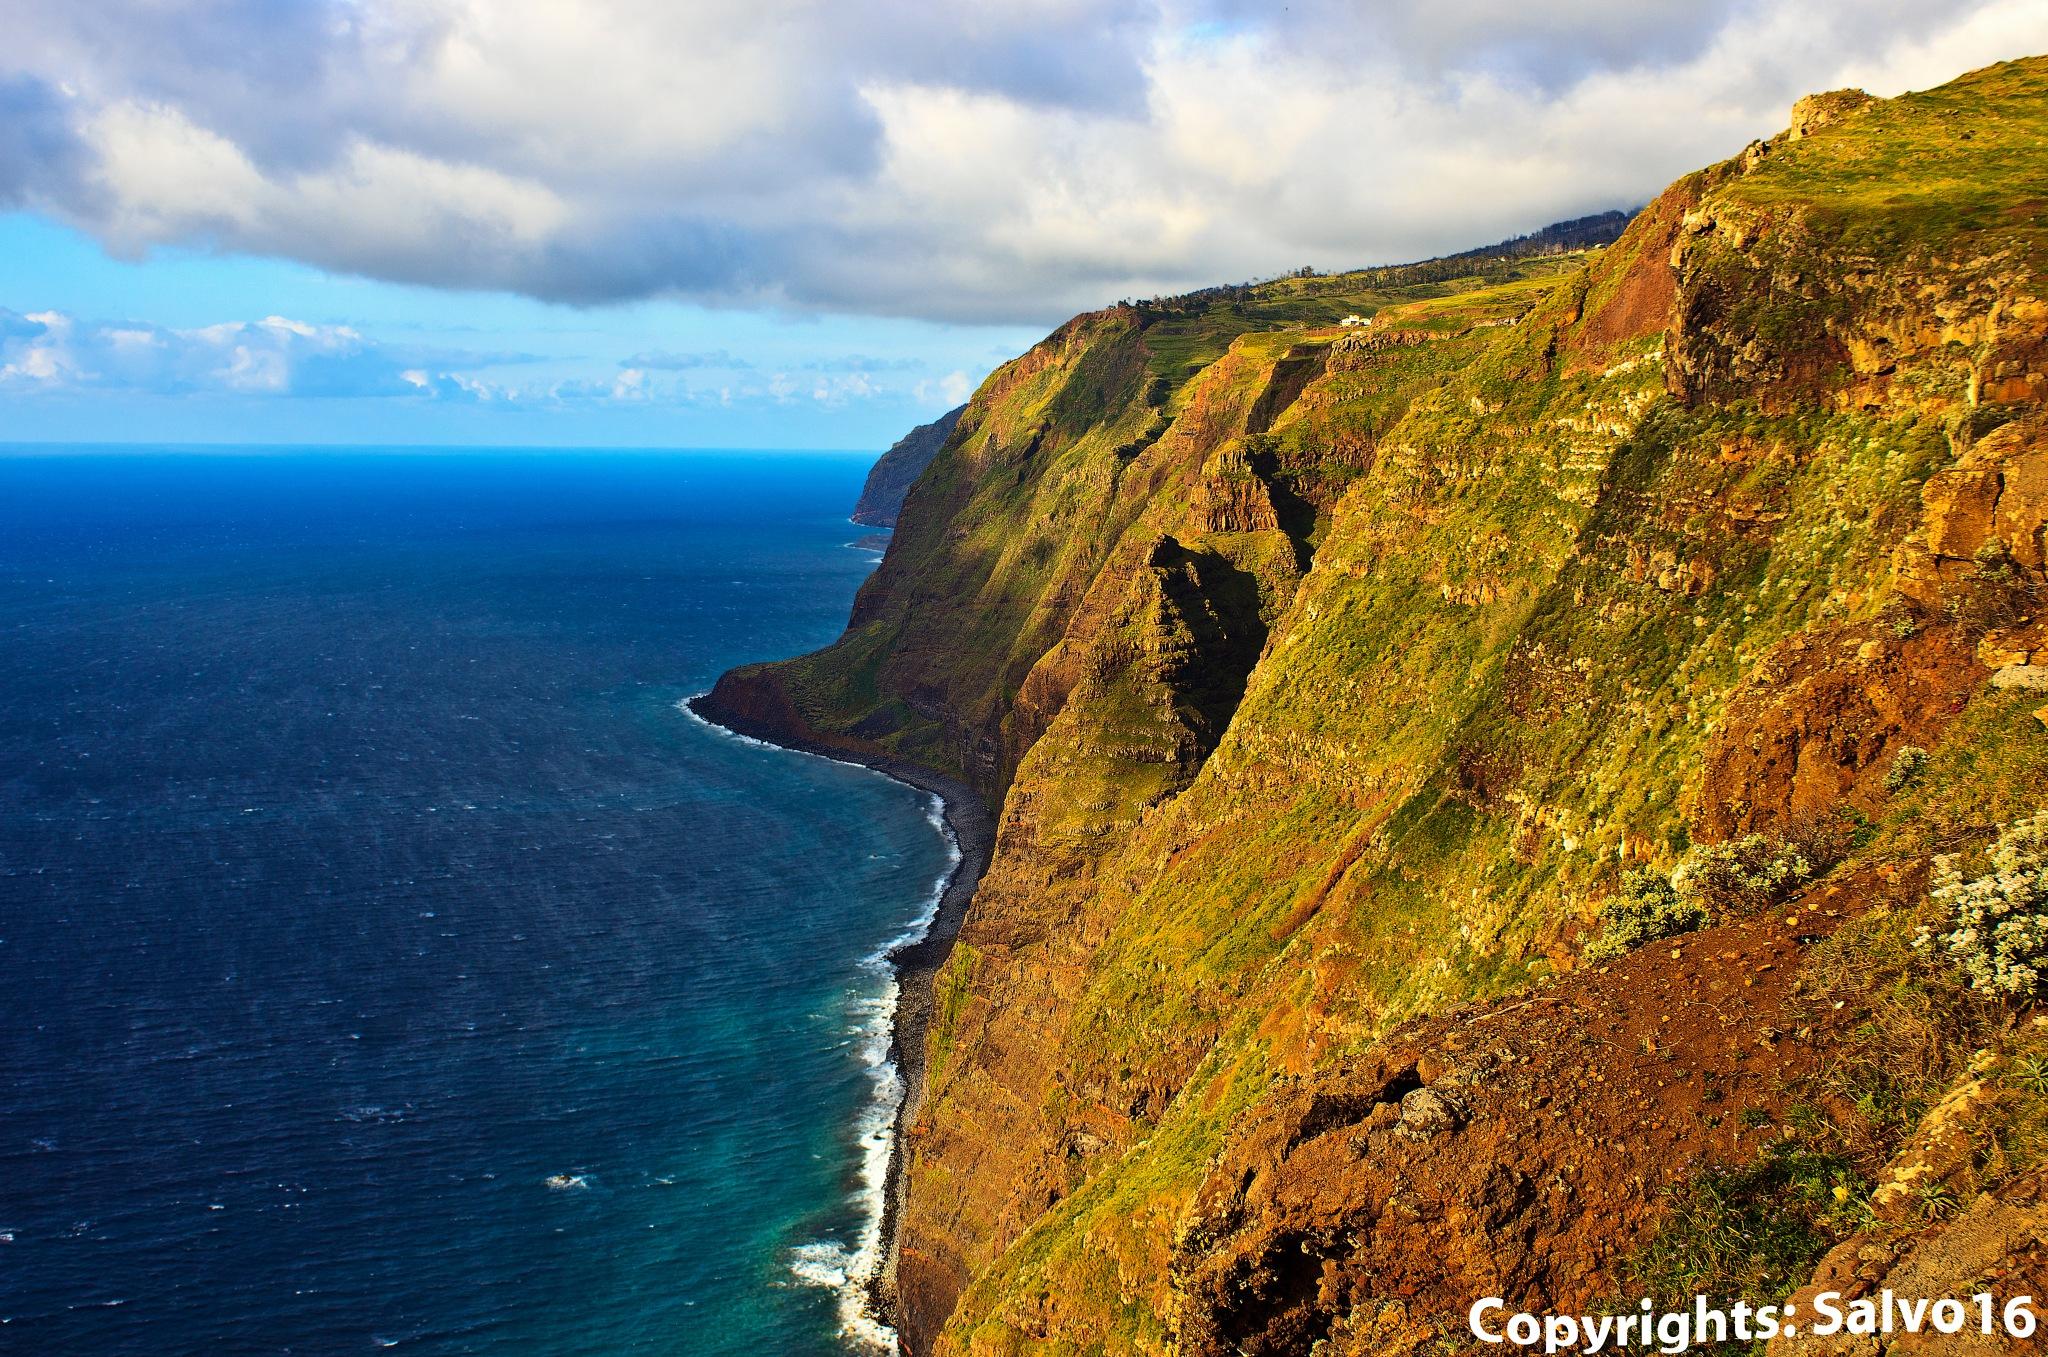 Santana's Cliffs by Salvo